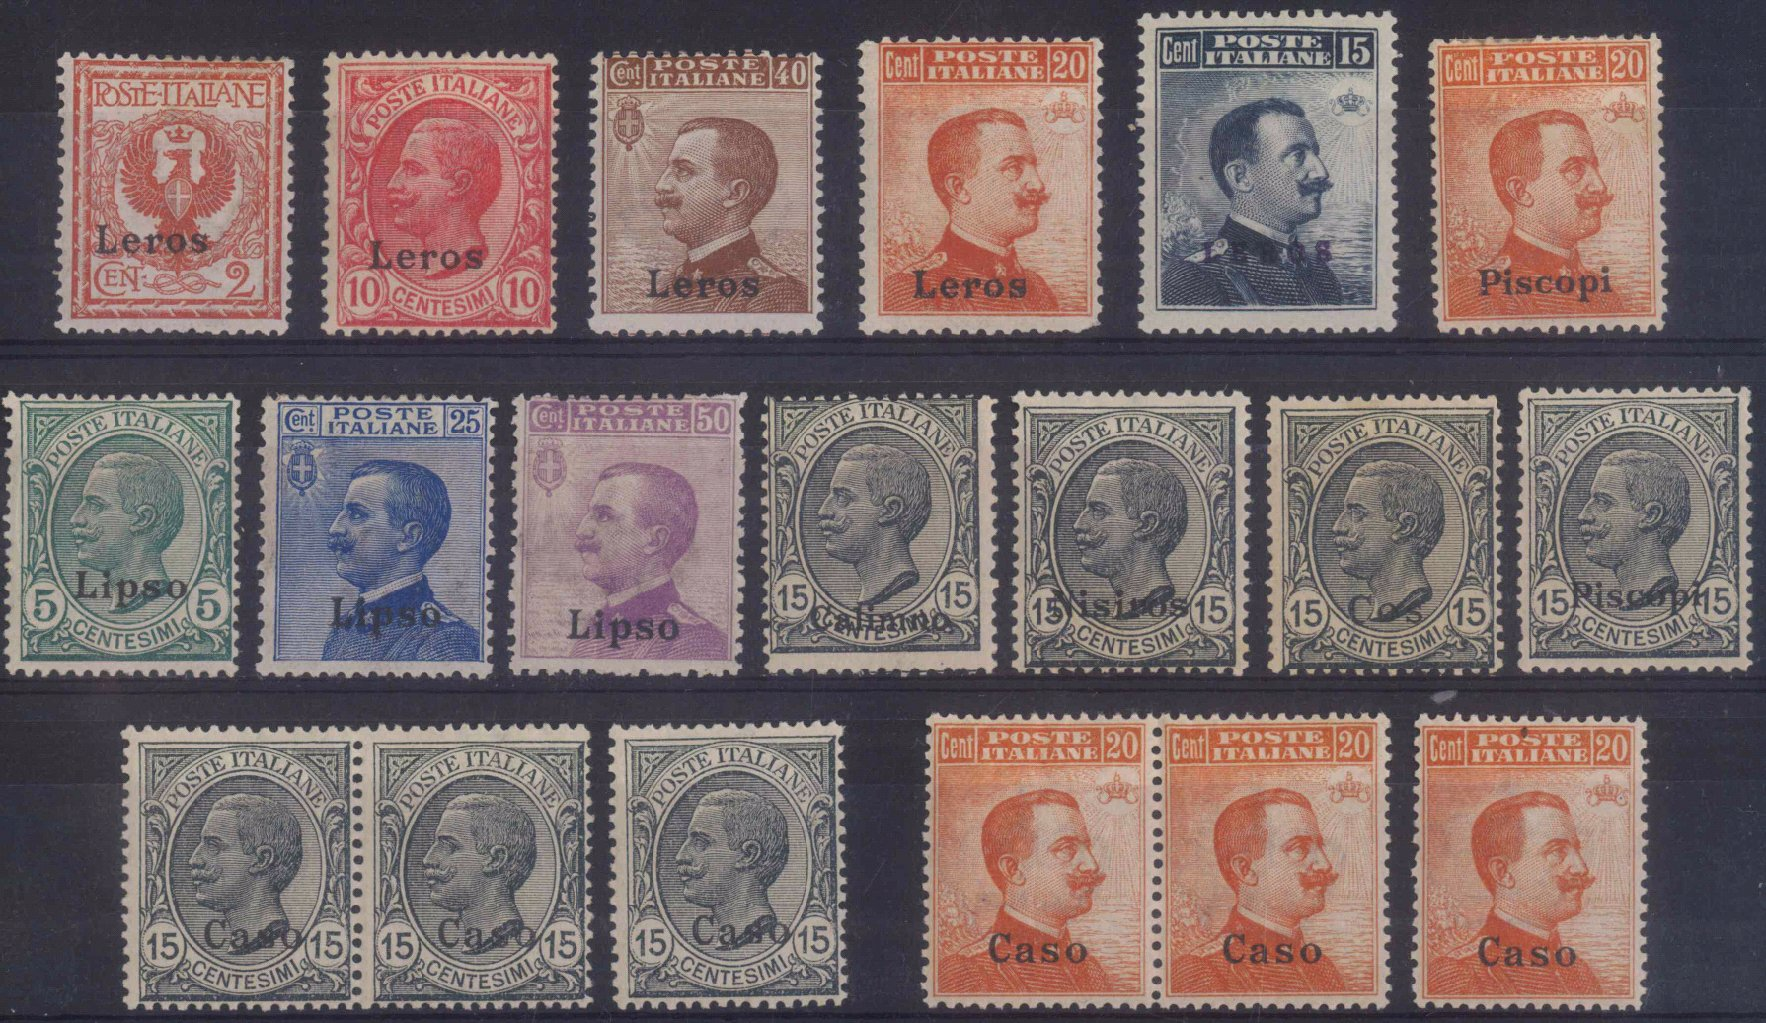 ÄGÄISCHE INSELN 1912